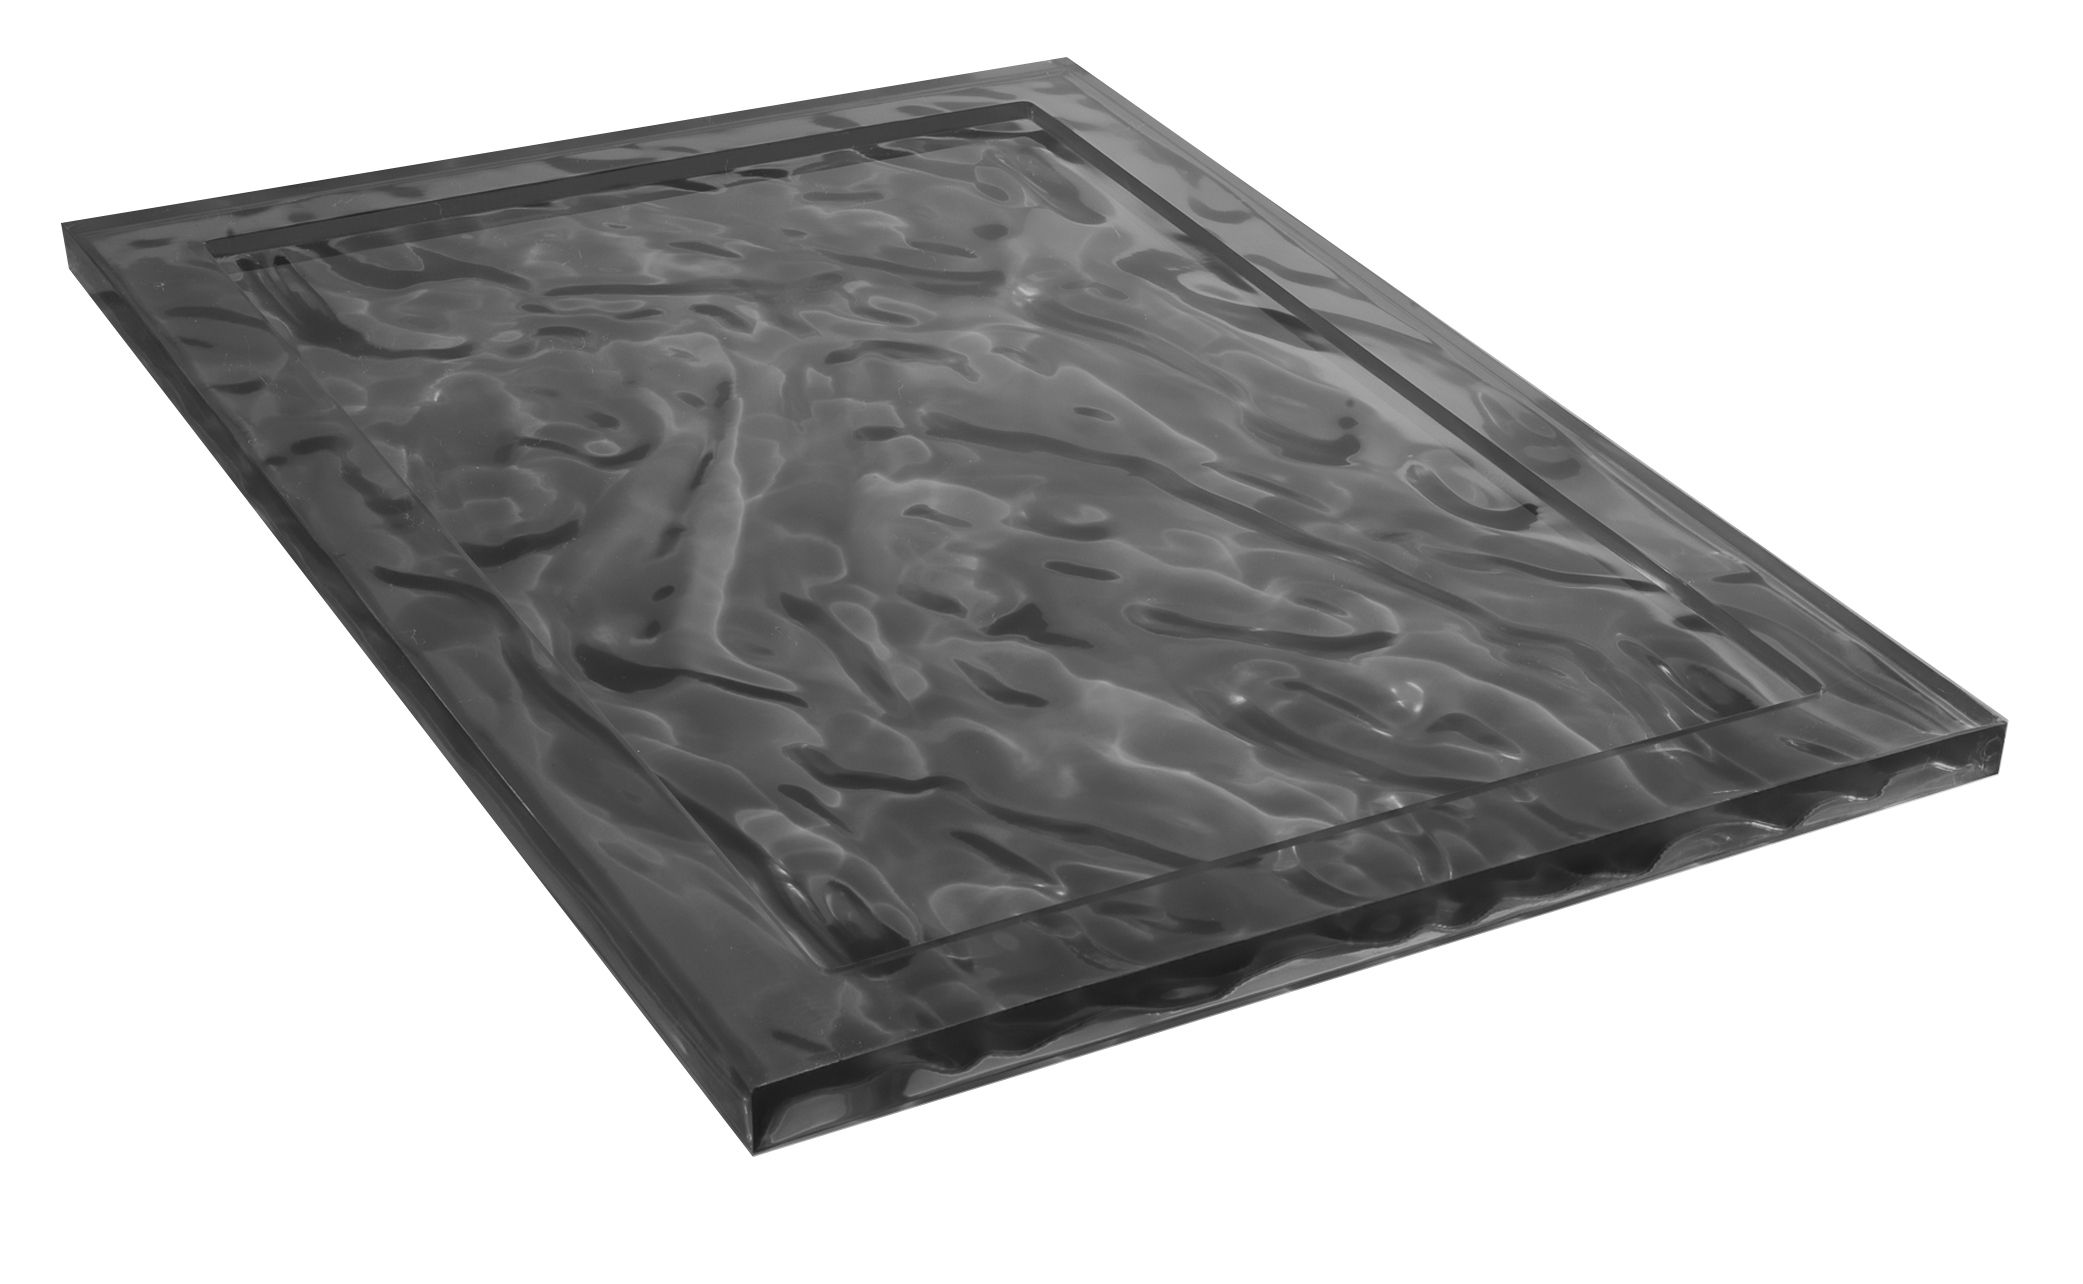 Tischkultur - Tabletts - Dune Small Tablett 46 x 32 cm - Kartell - Rauch - Technoplymer